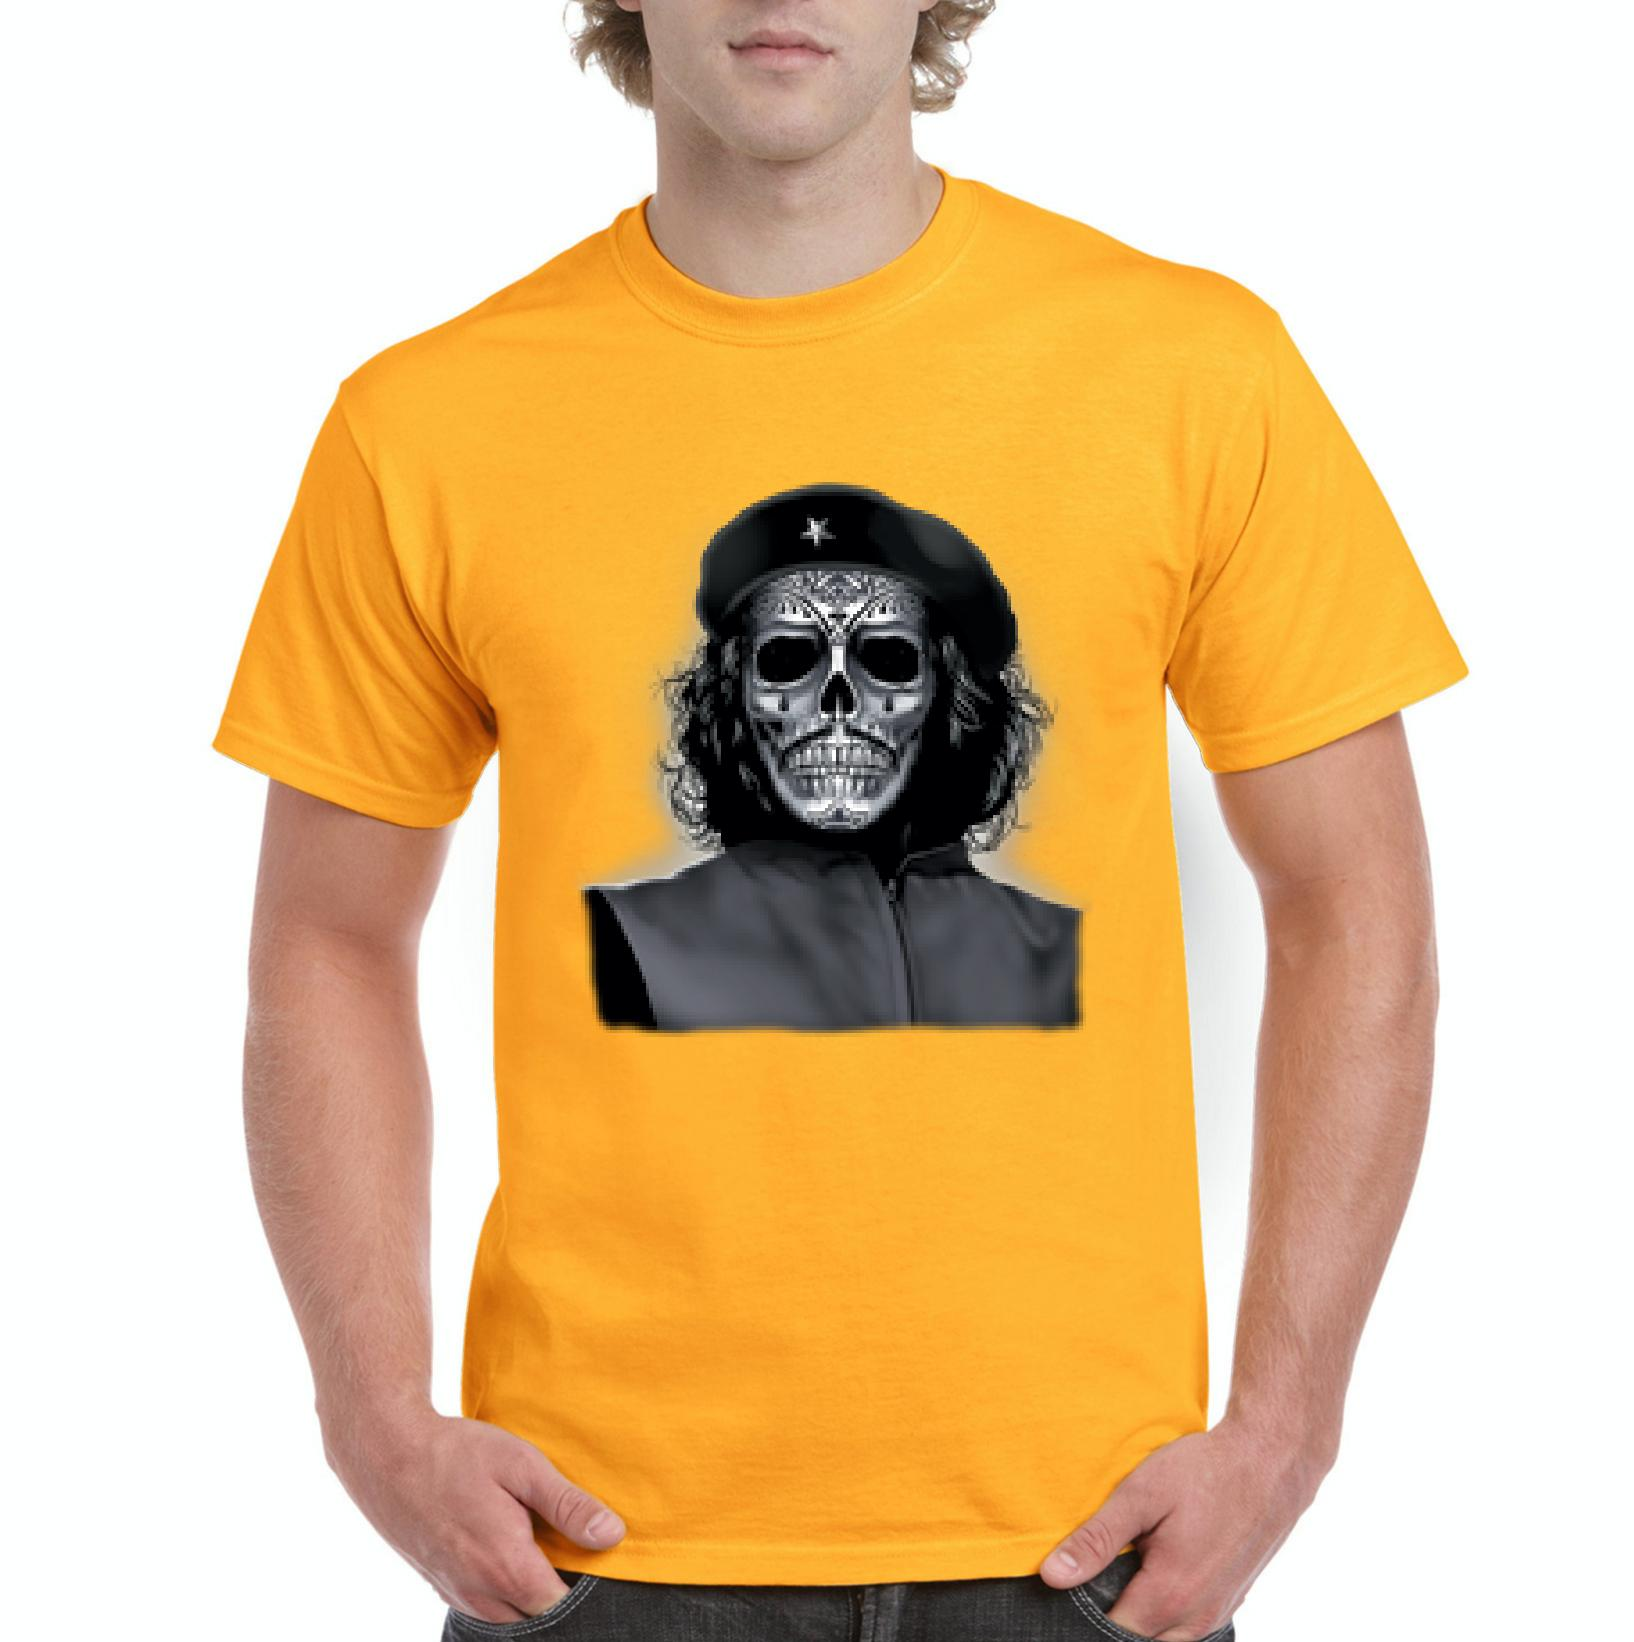 Artix - Halloween T-Shirt Che Guevara Skull Halloween Costumes Idea ... c2c1d6cf9